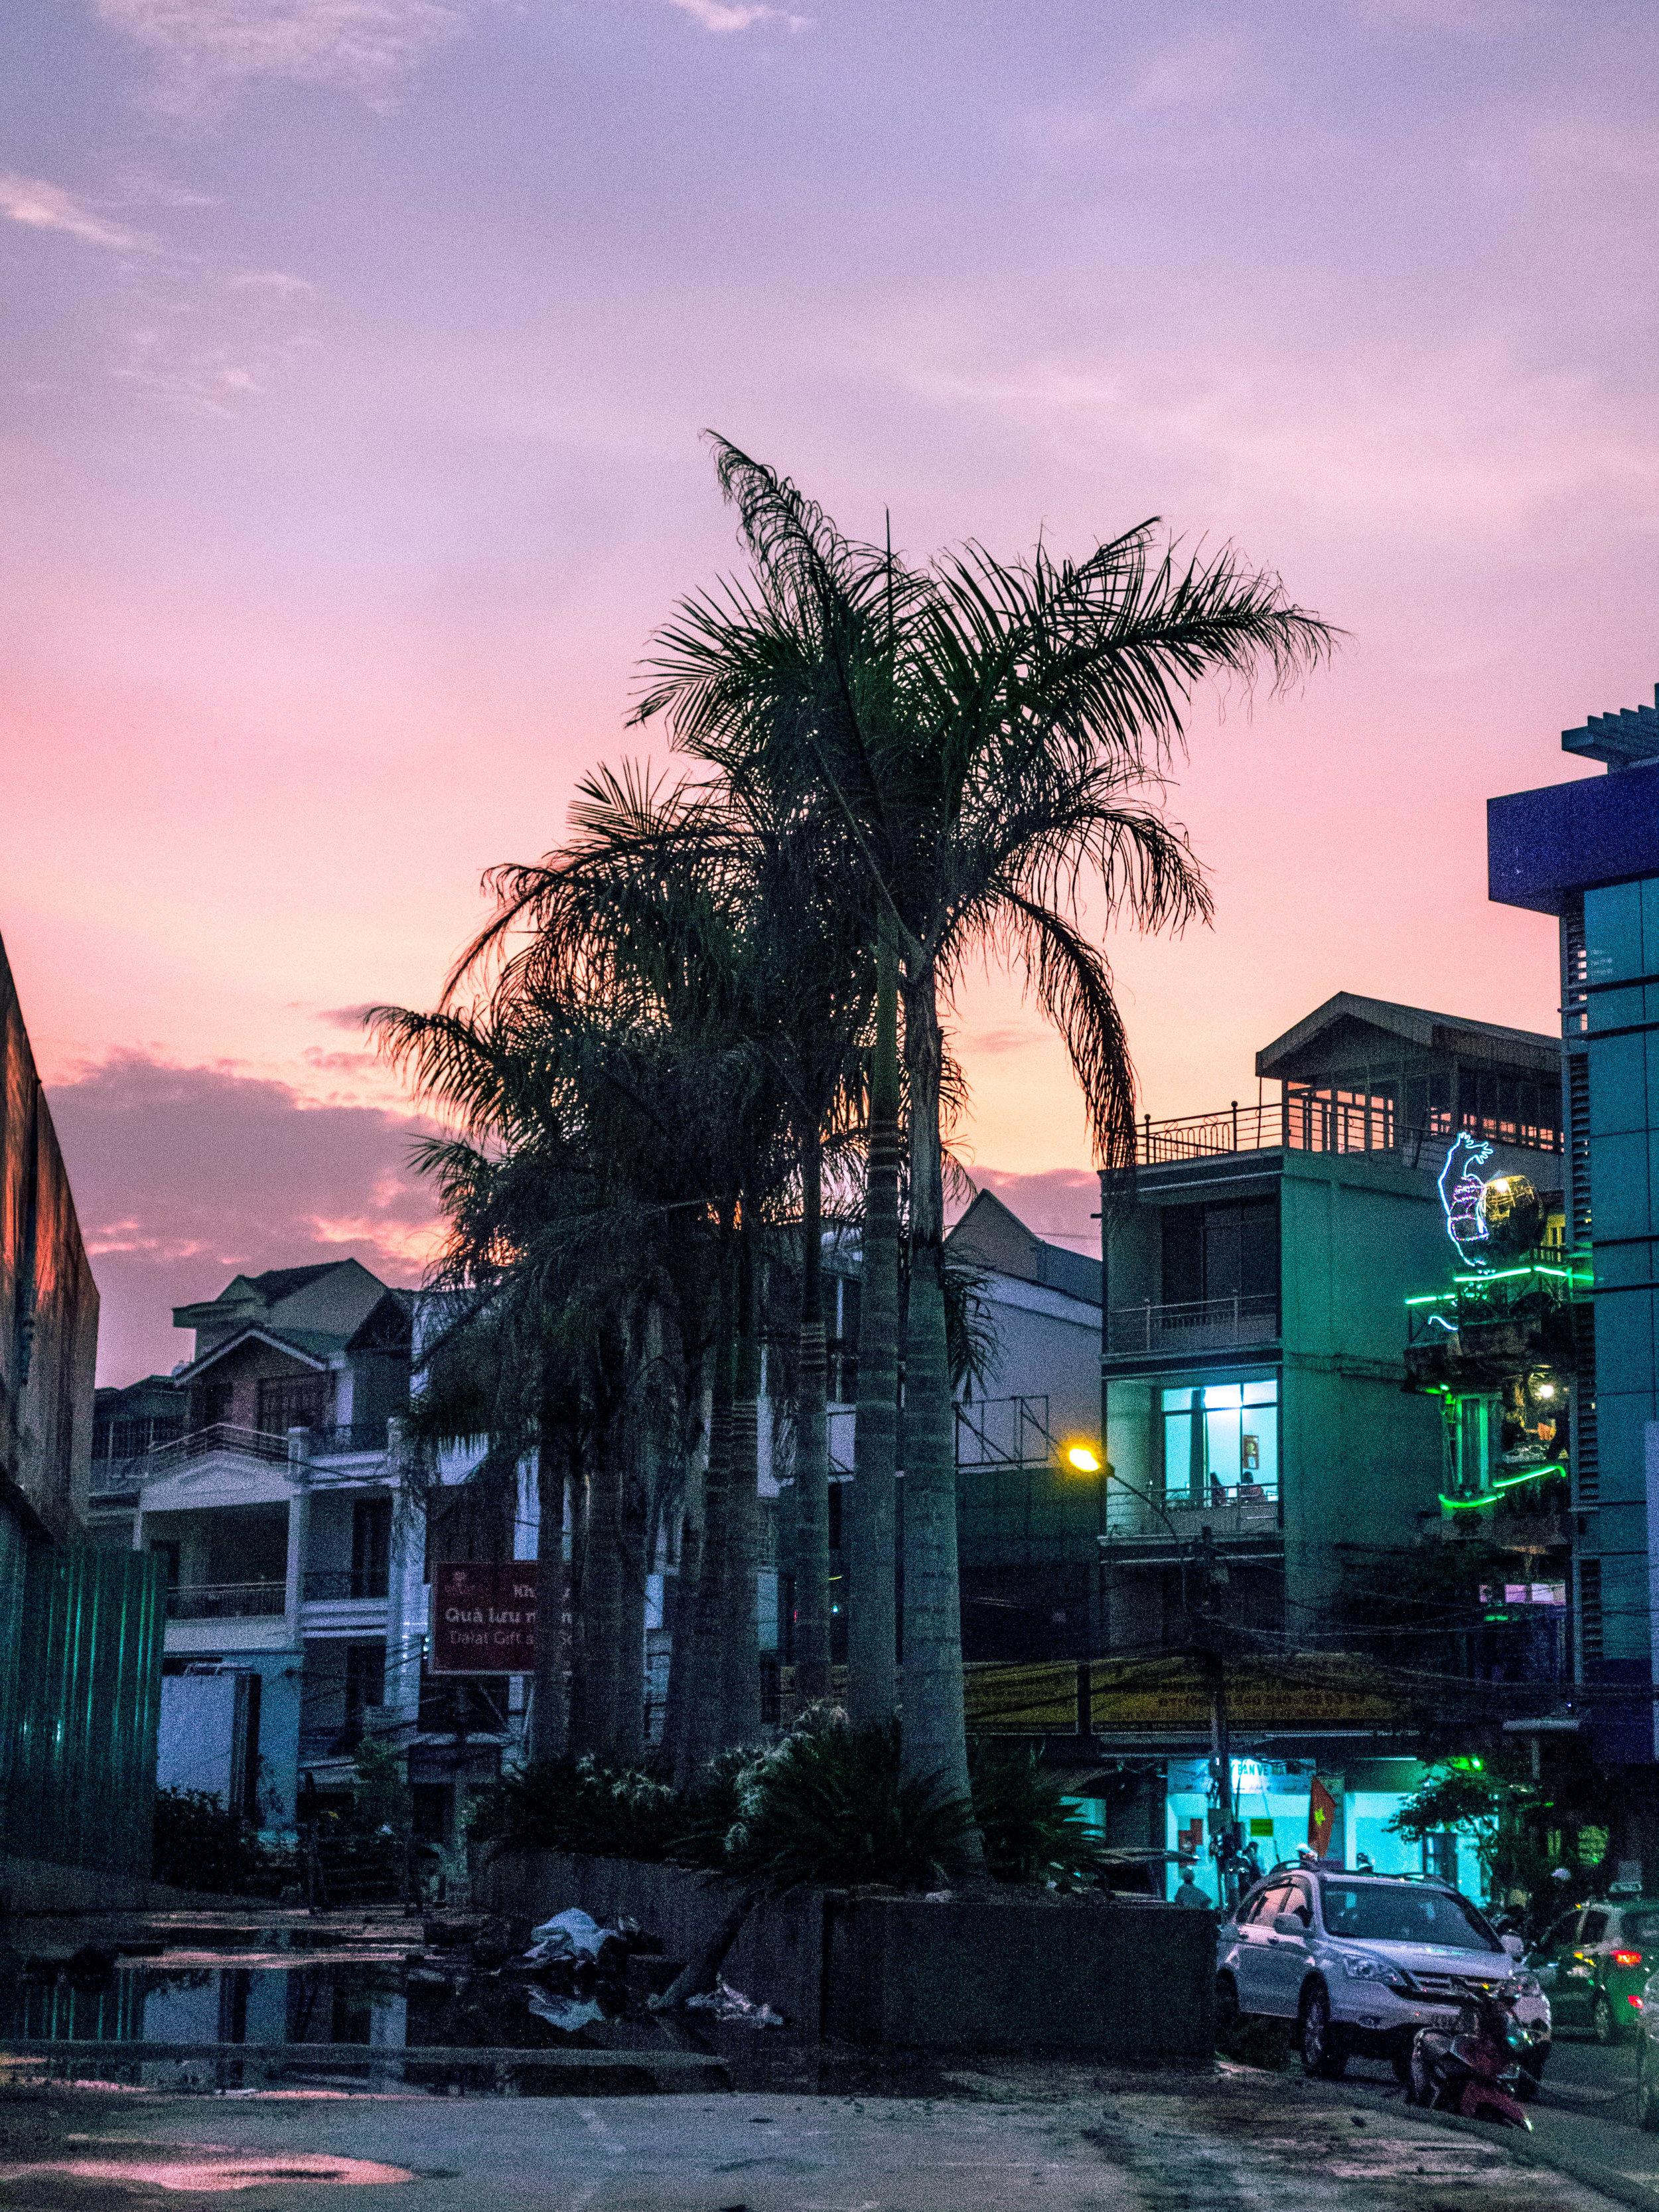 Sunset in Da Lat, Vietnam